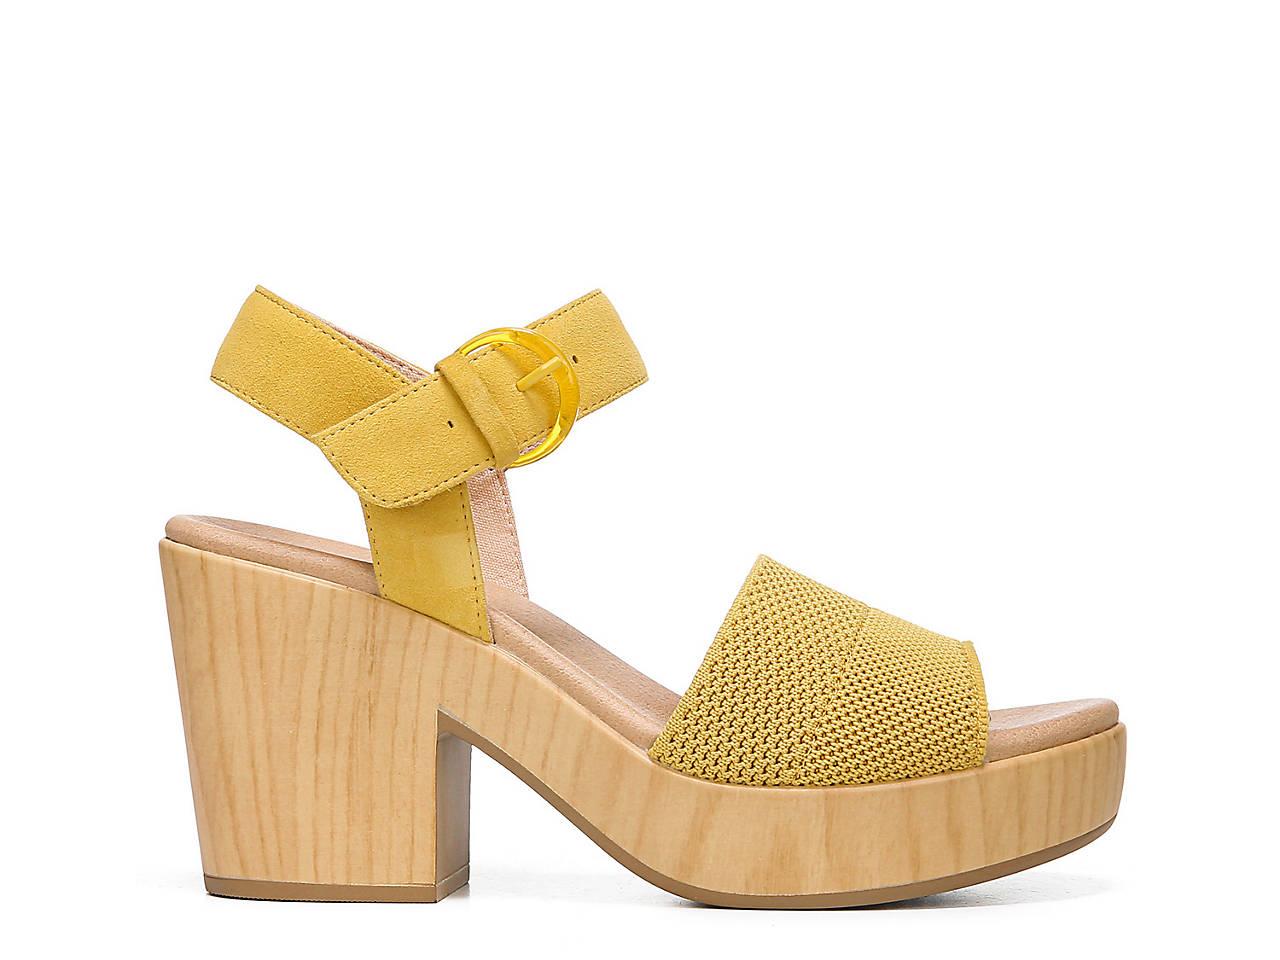 824abeb10847 Dr. Scholl s Brickell Platform Sandal Women s Shoes